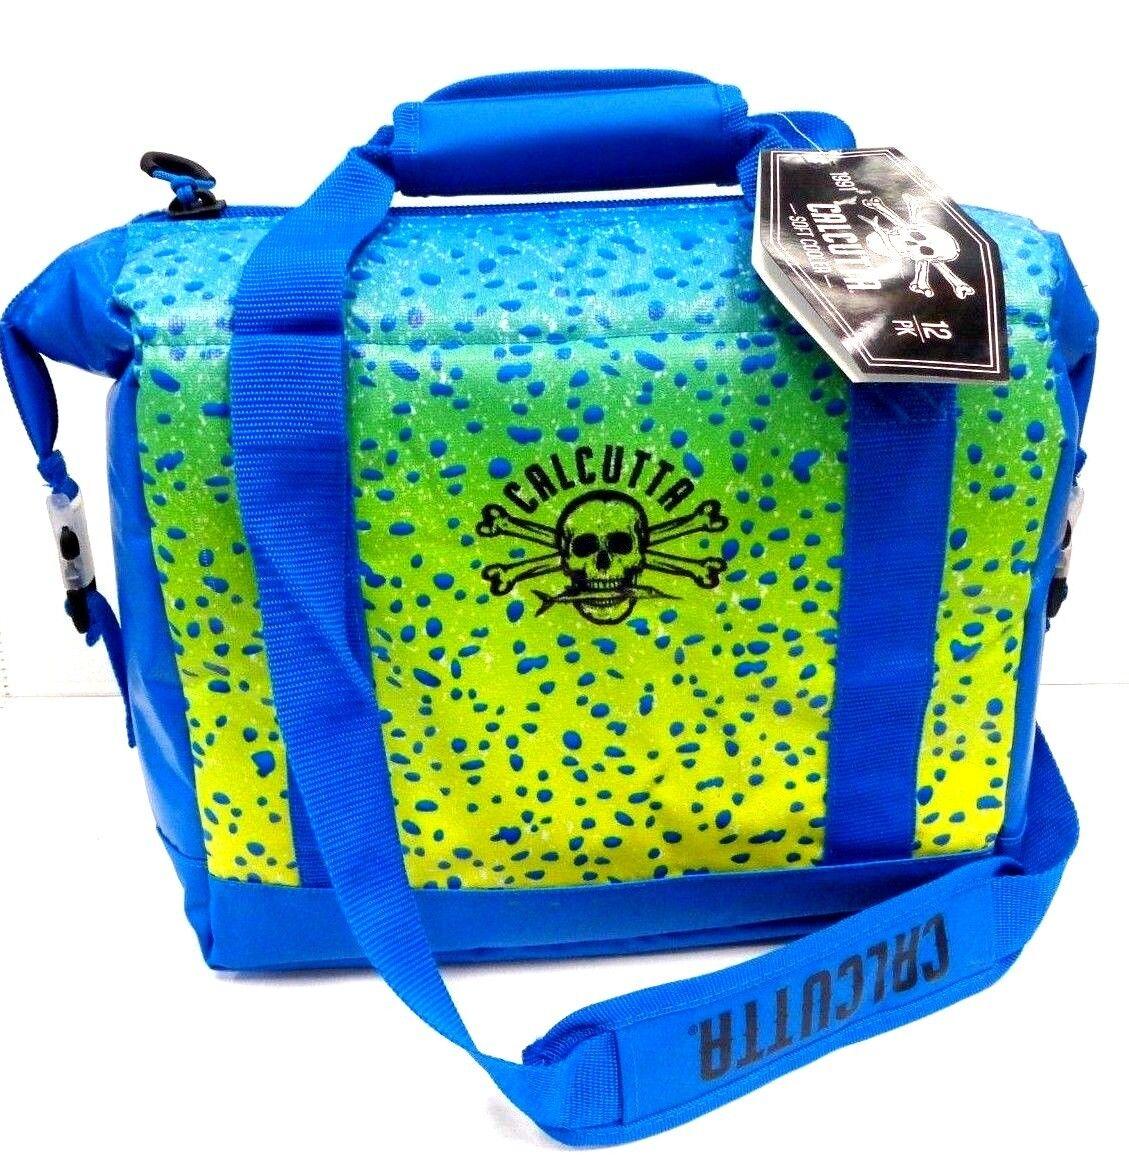 Calcutta Soft Sided Cooler Bag MAHI  Print CSSCM-12 - 12-CAN - Leak-Proof - NEW  convenient